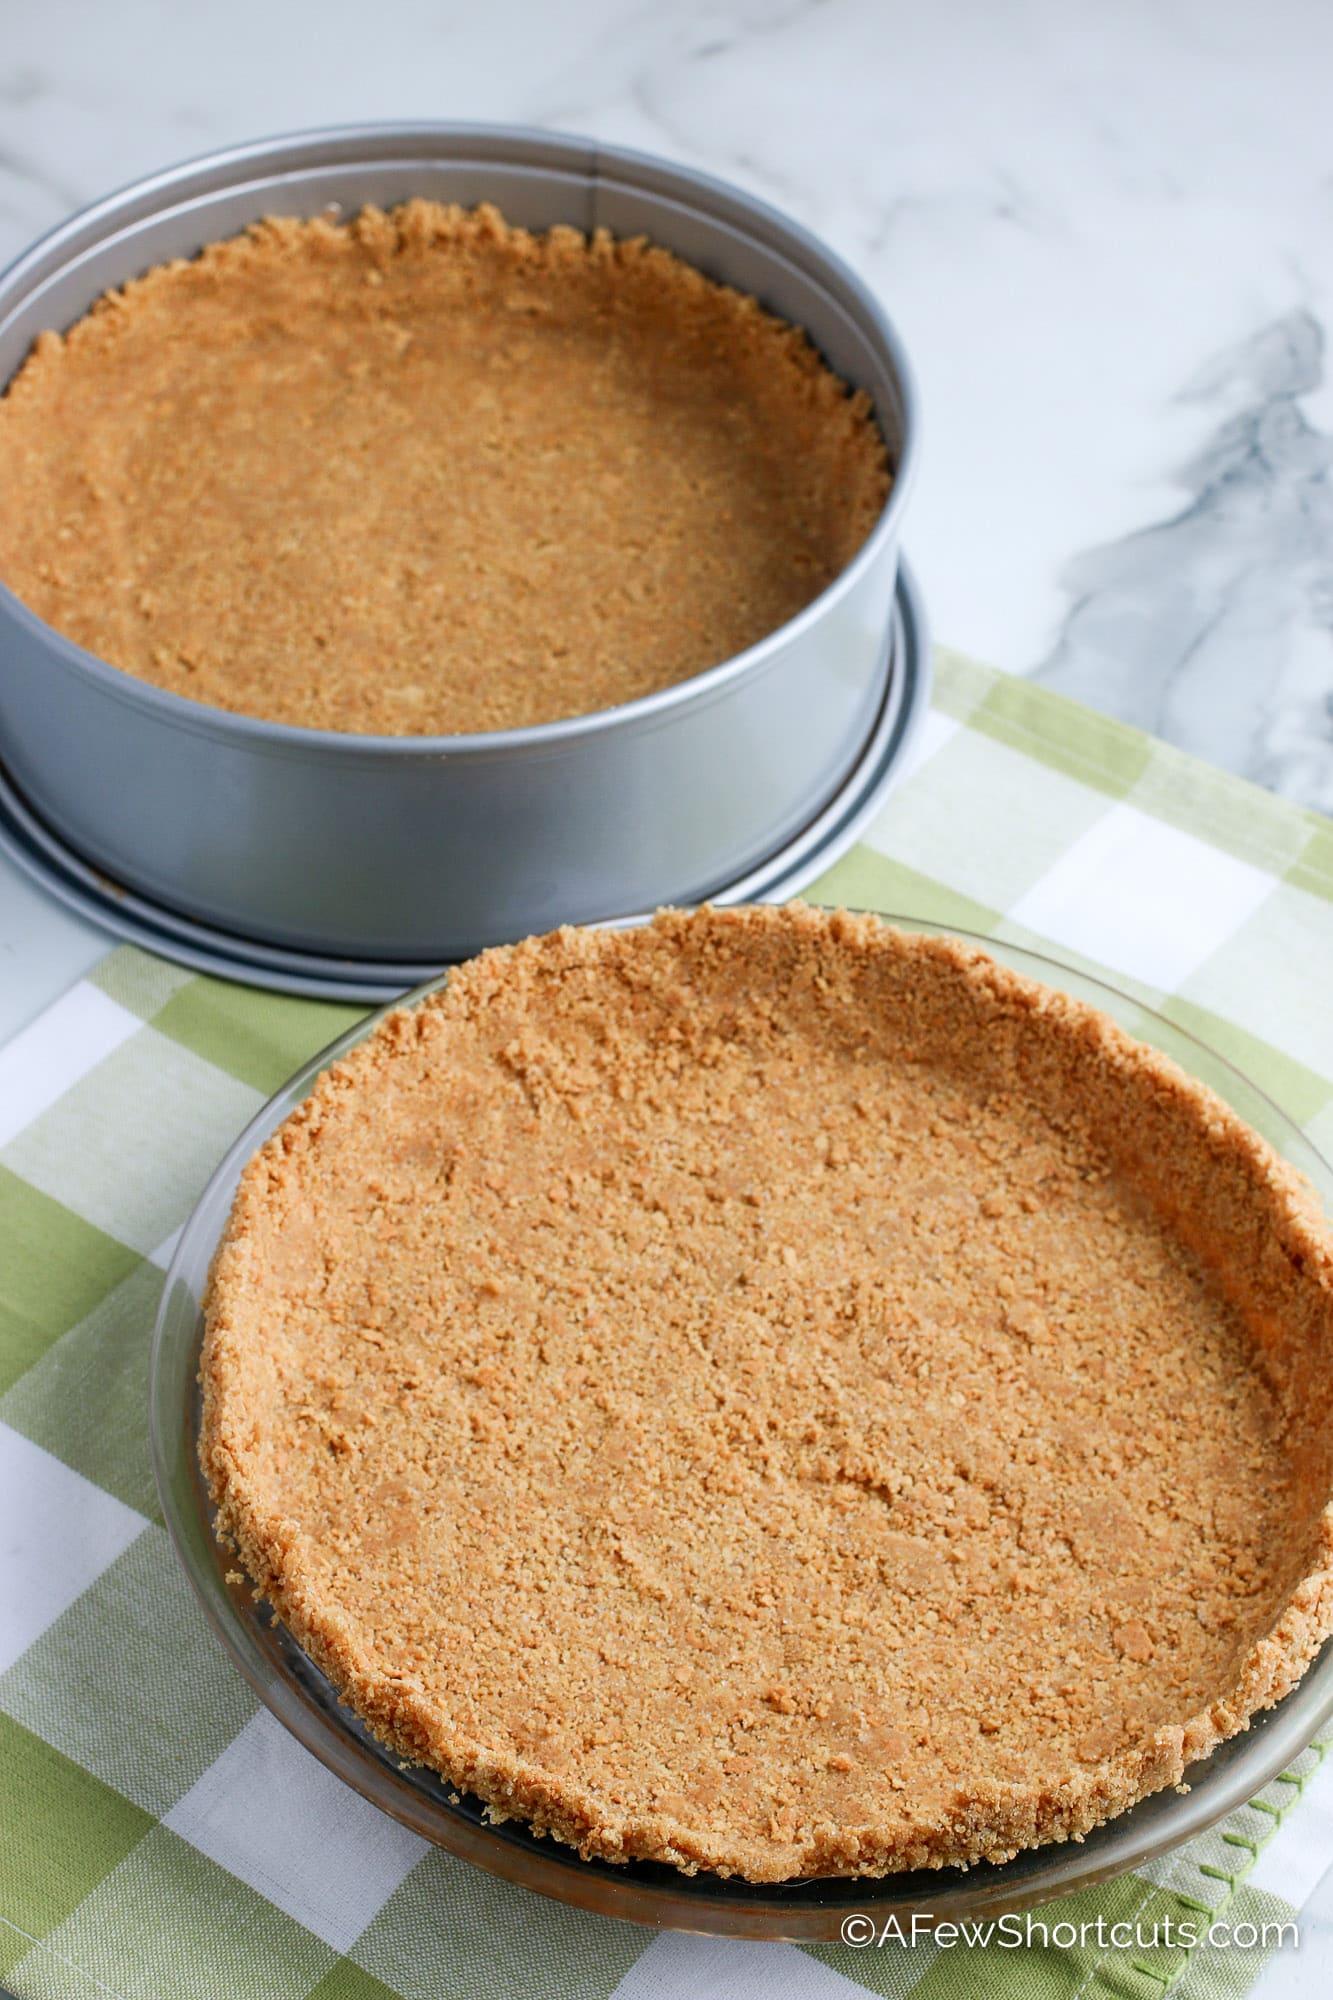 Graham Cracker Crusts in pie pan and springform pan